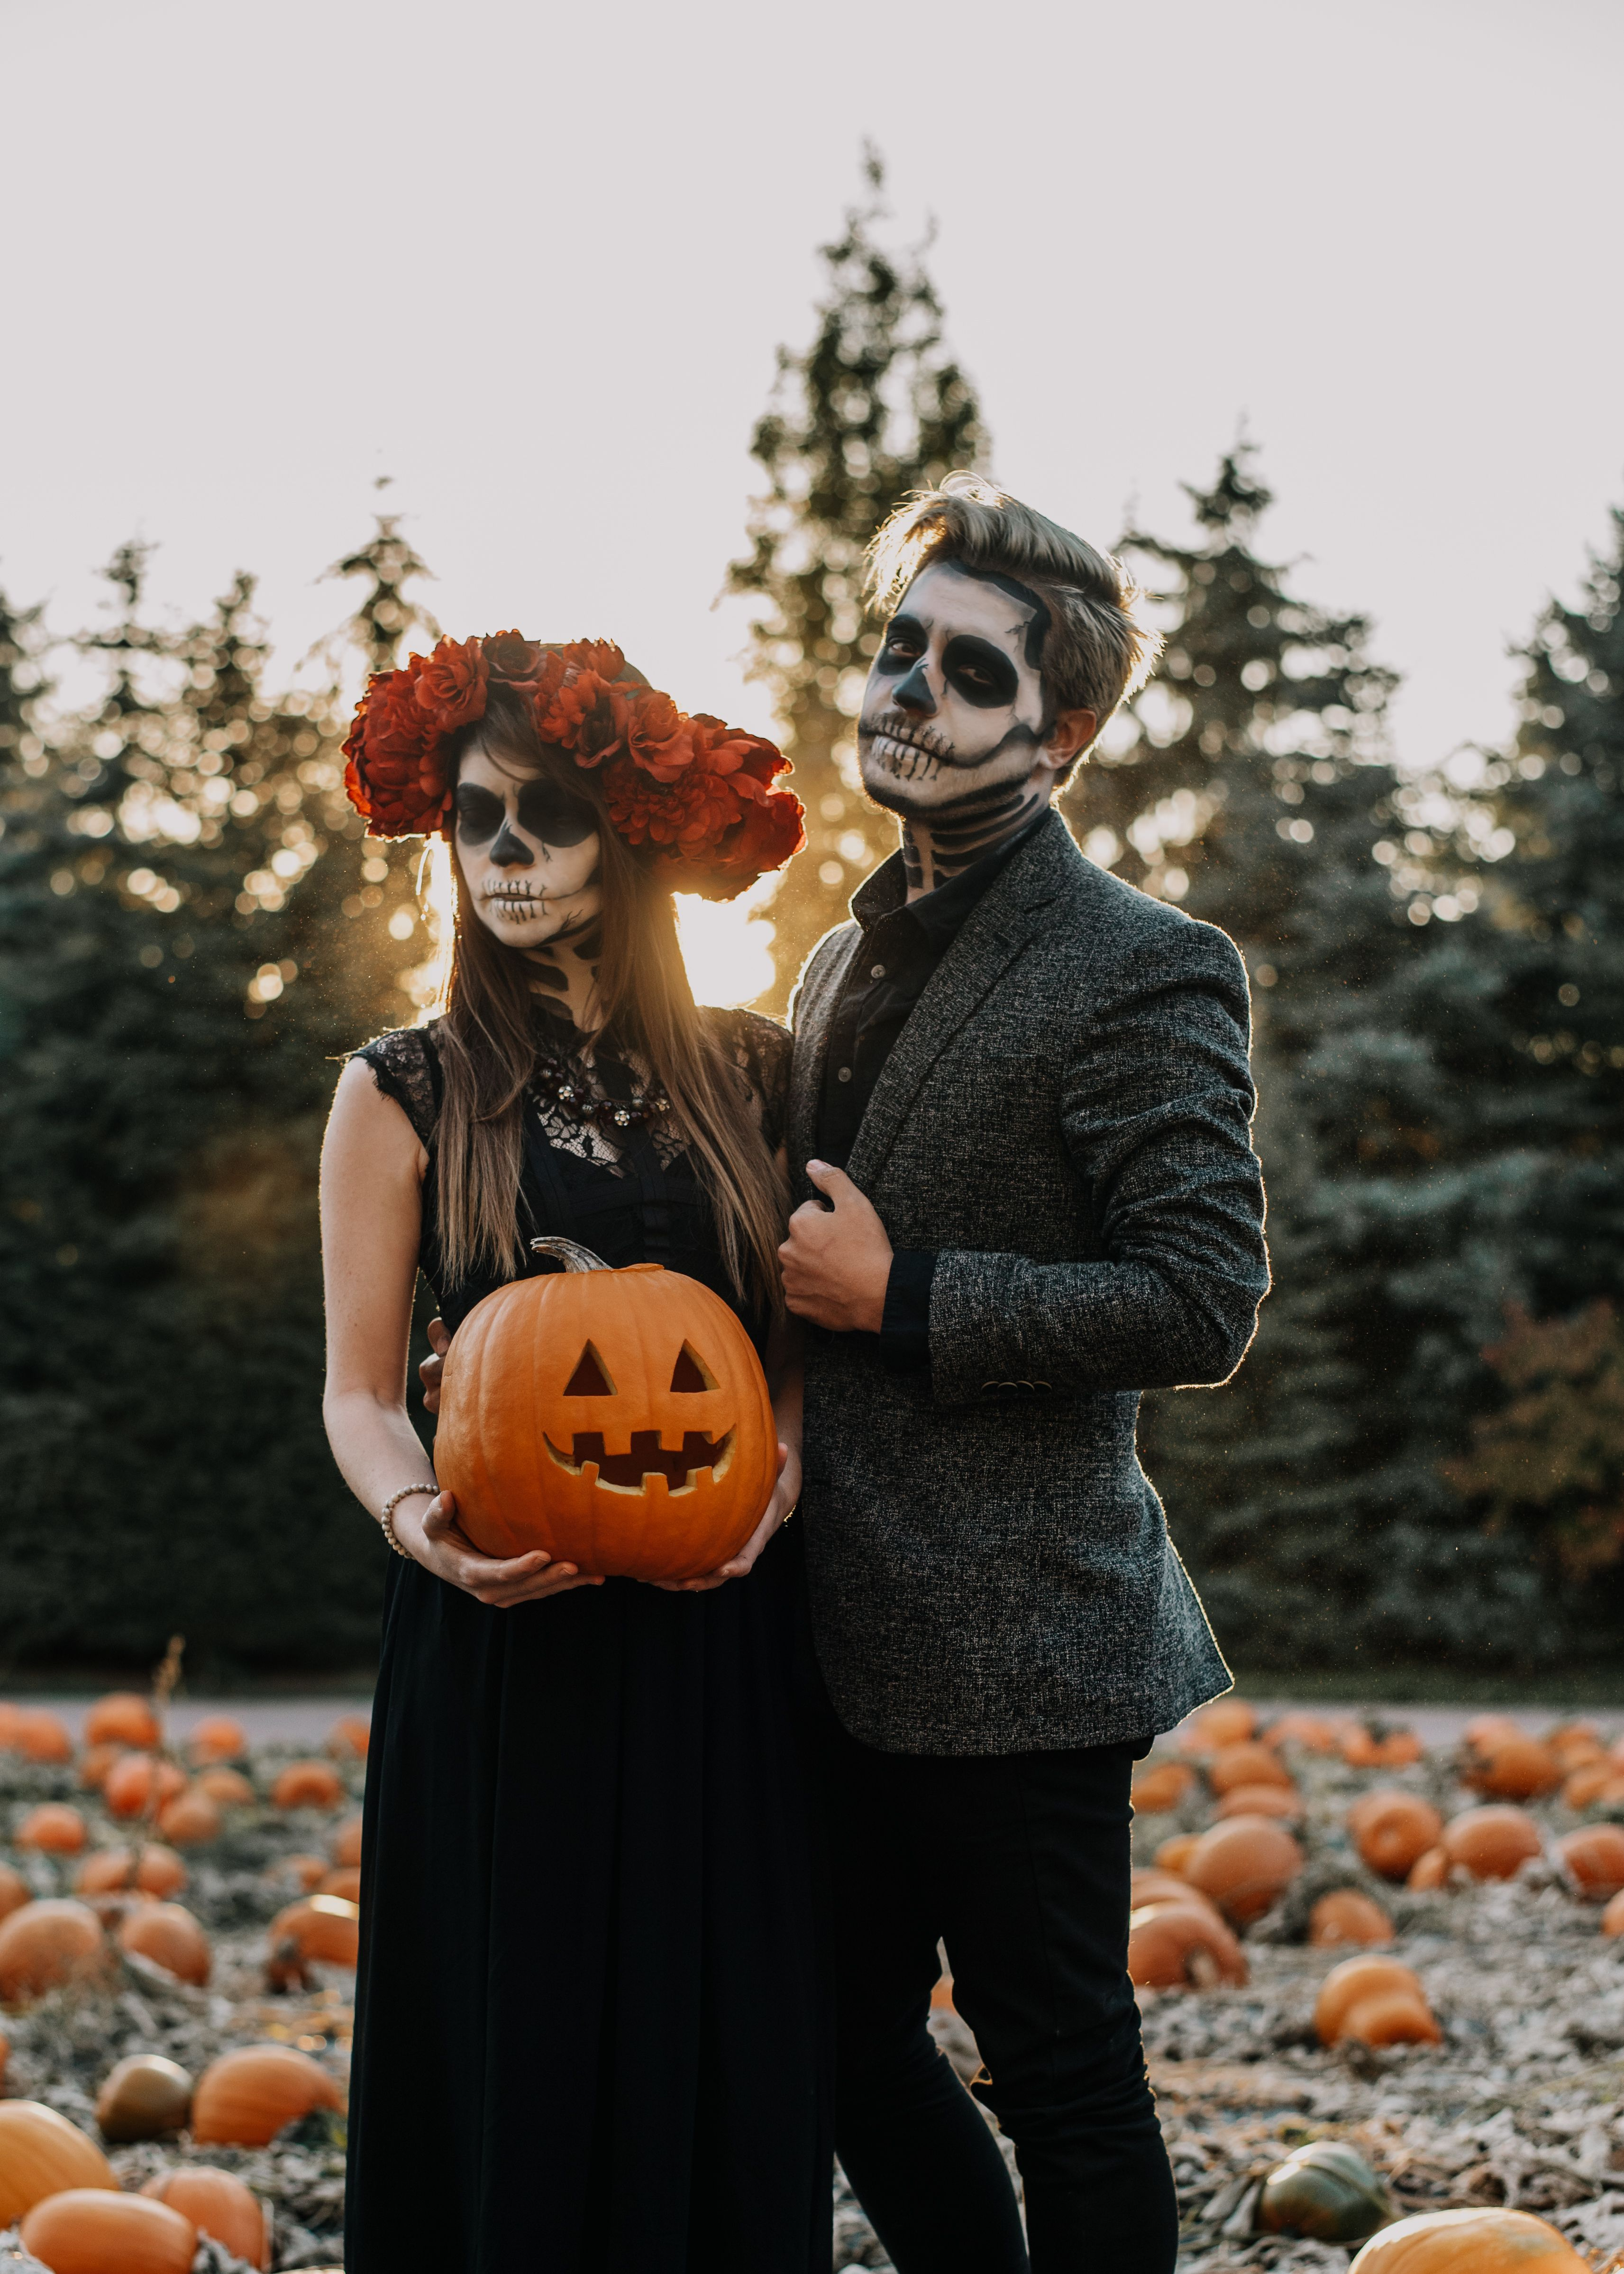 Halloween Costume Photoshoot Costumes, Photoshoot